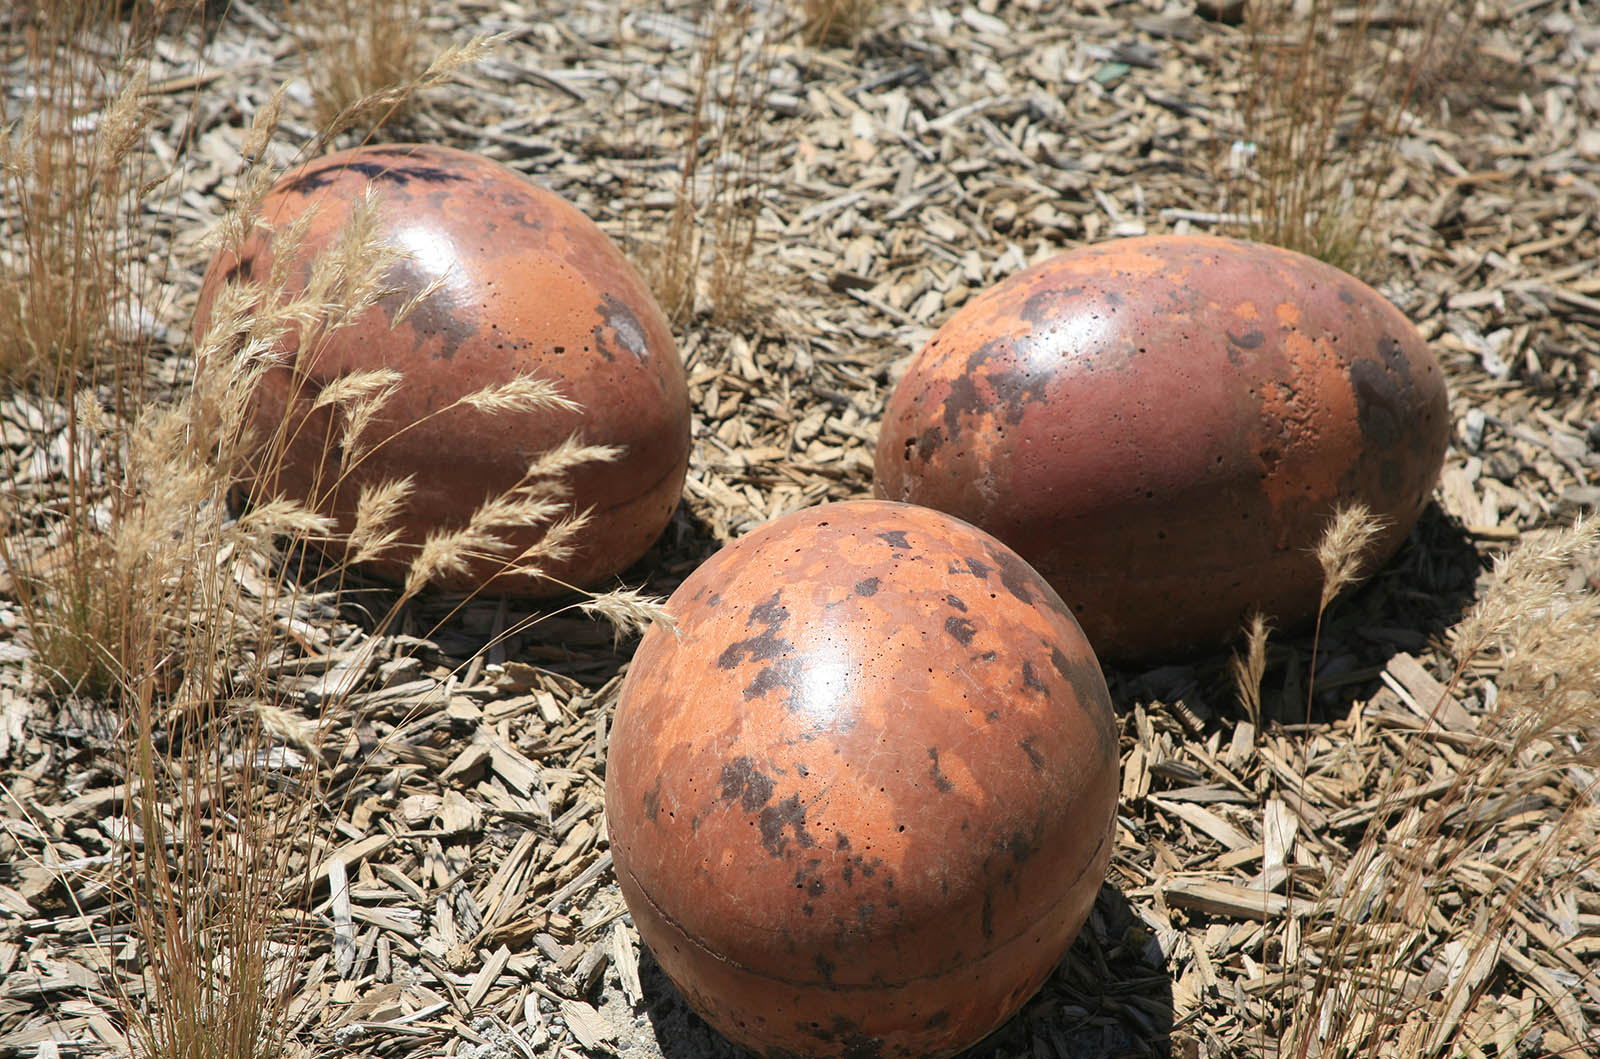 Customs_0002_Polished concrete eggs!